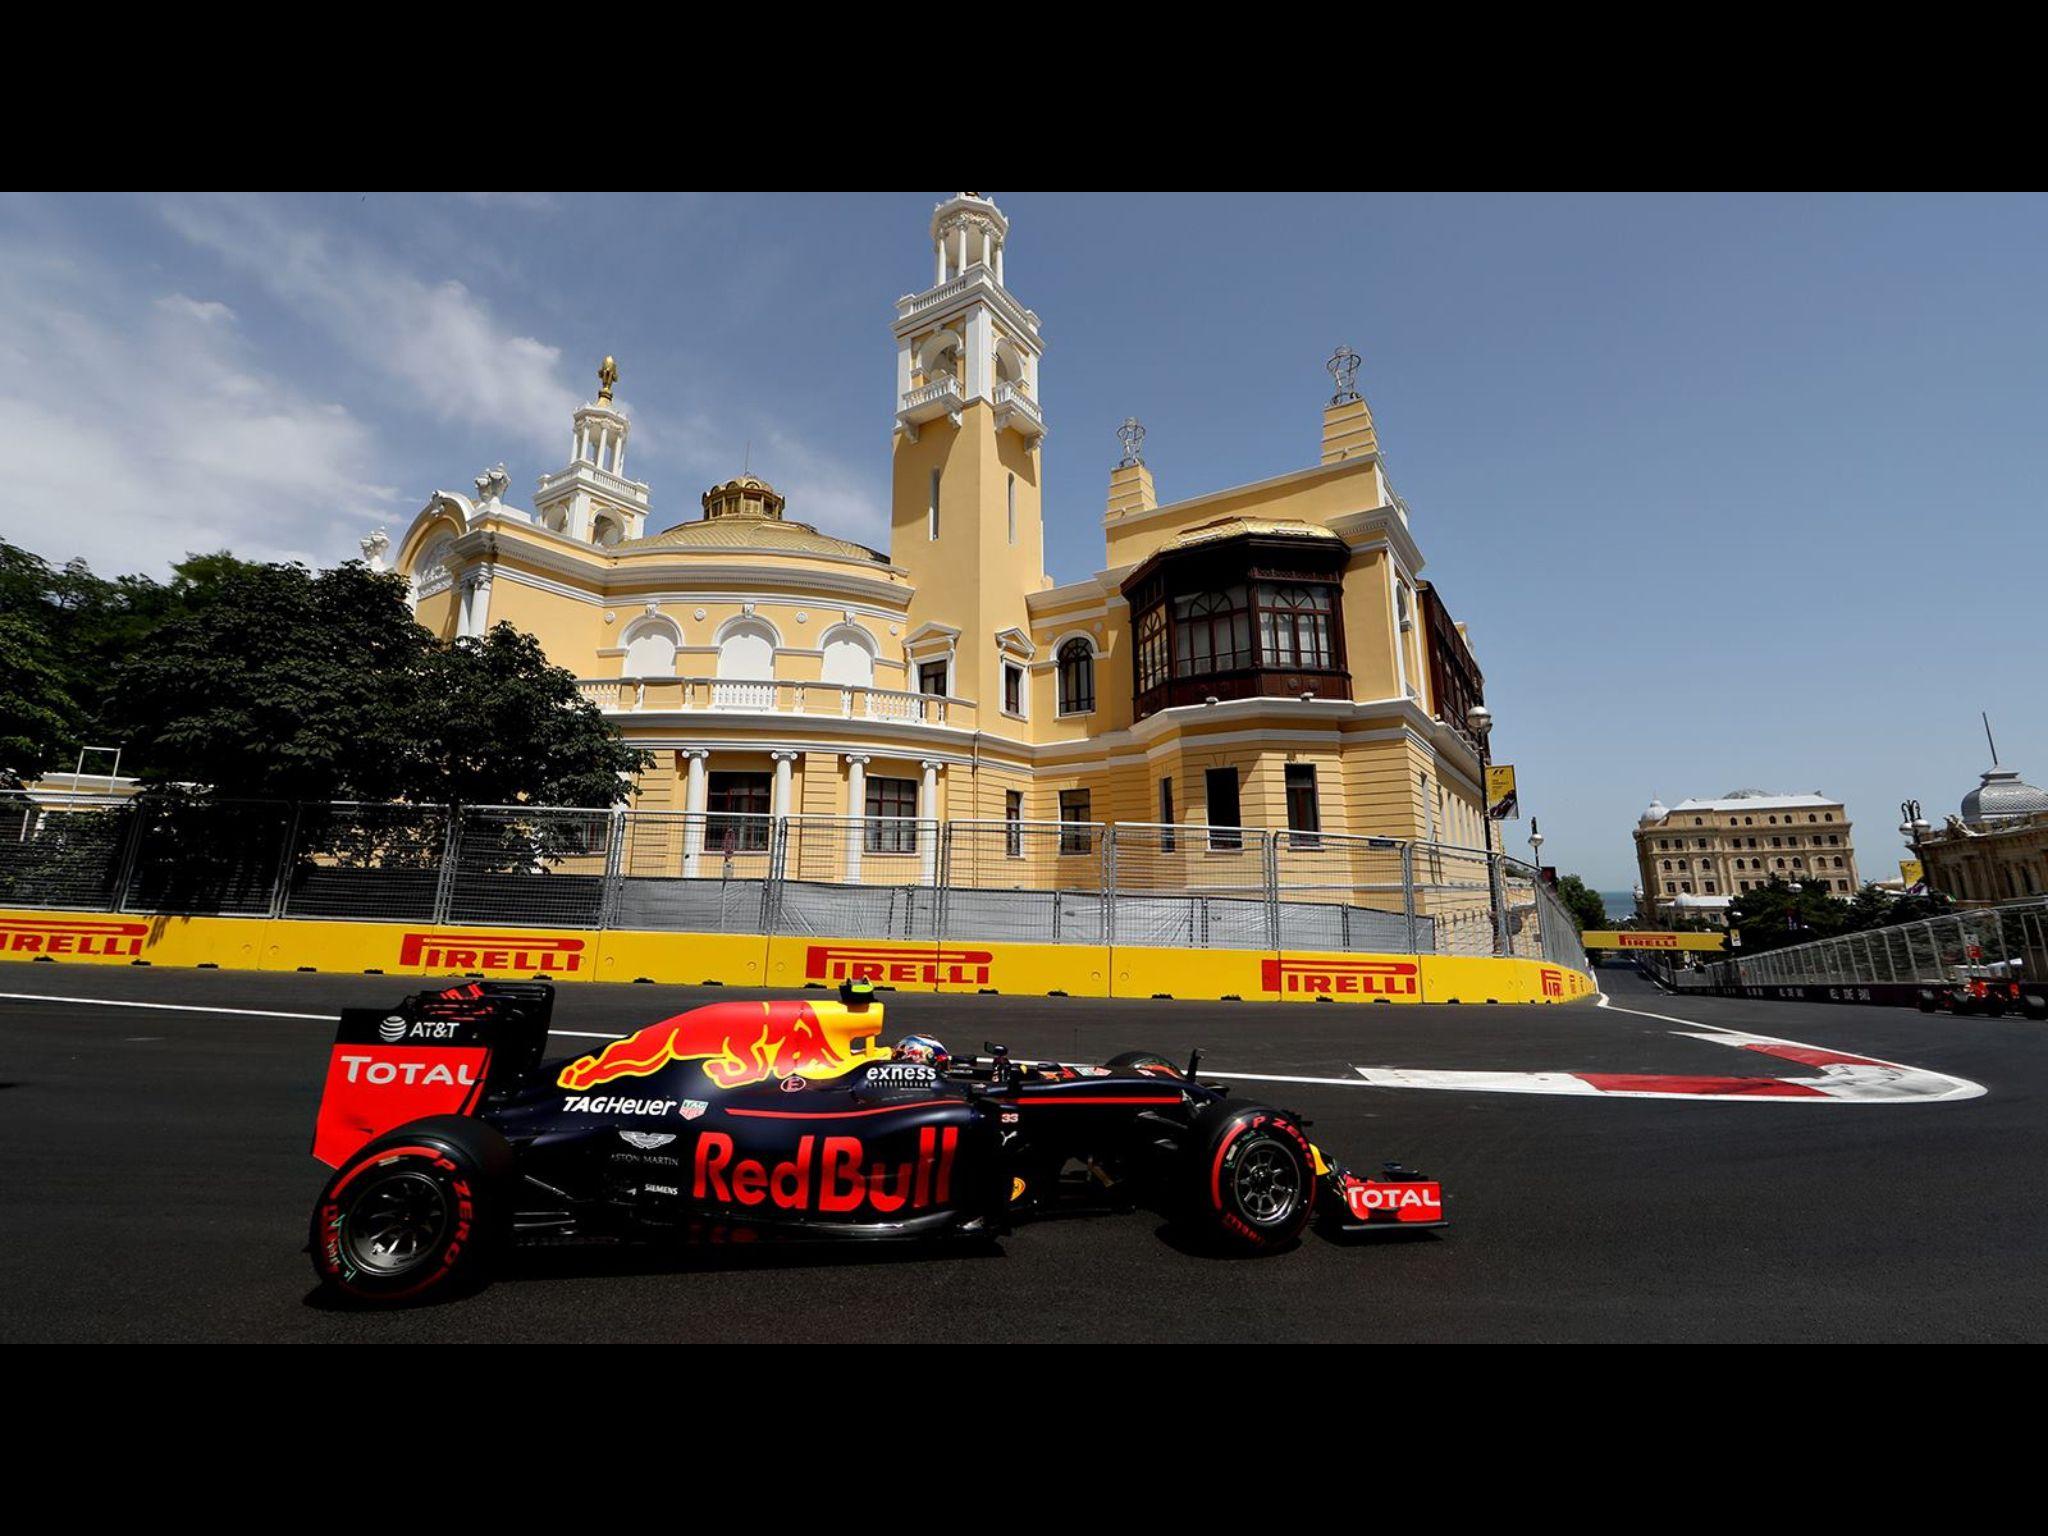 GP of Europe 2016 in Baku. Max Verstappen on track.